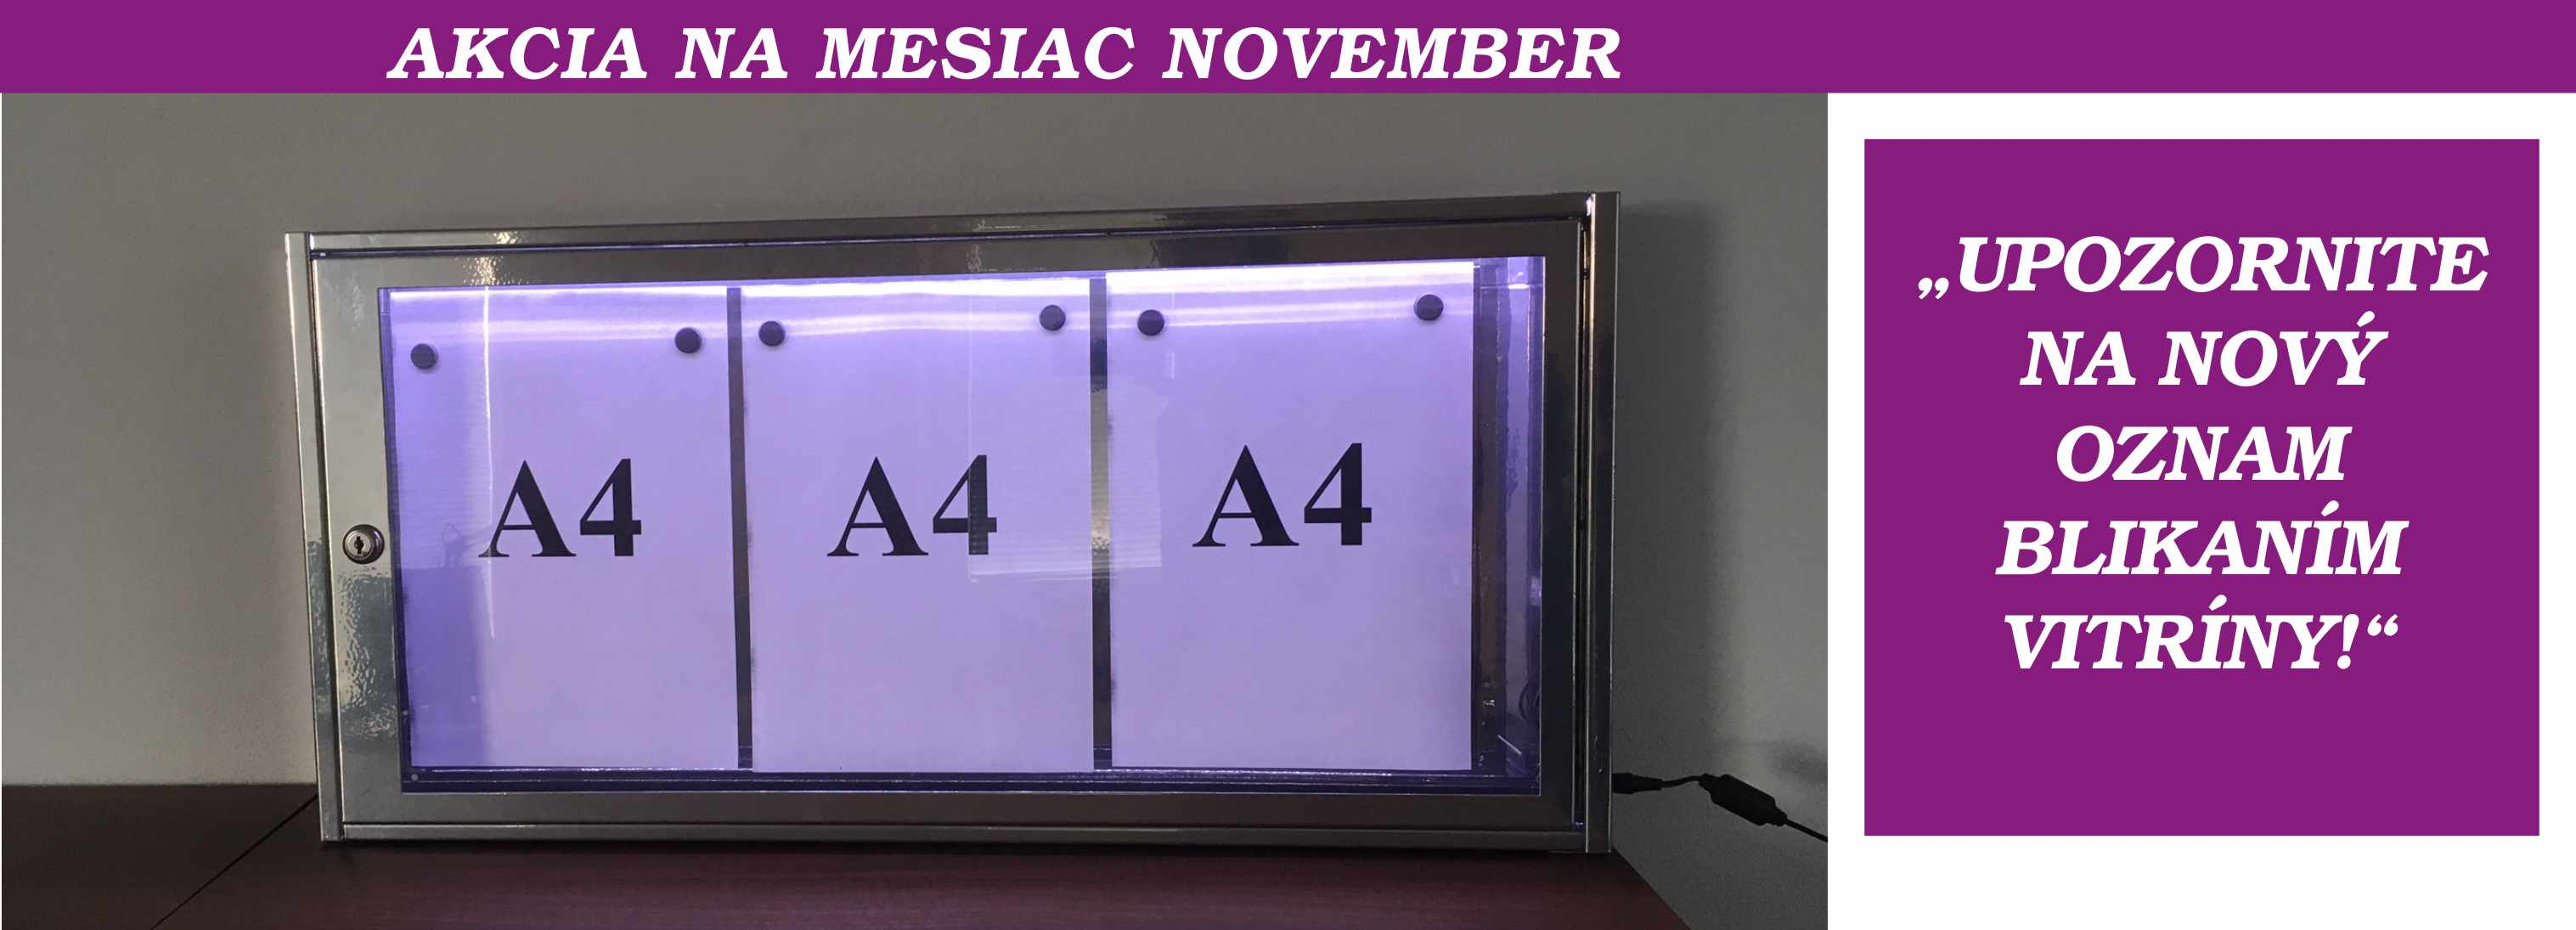 akcia-november-blikanie-vitriny-4